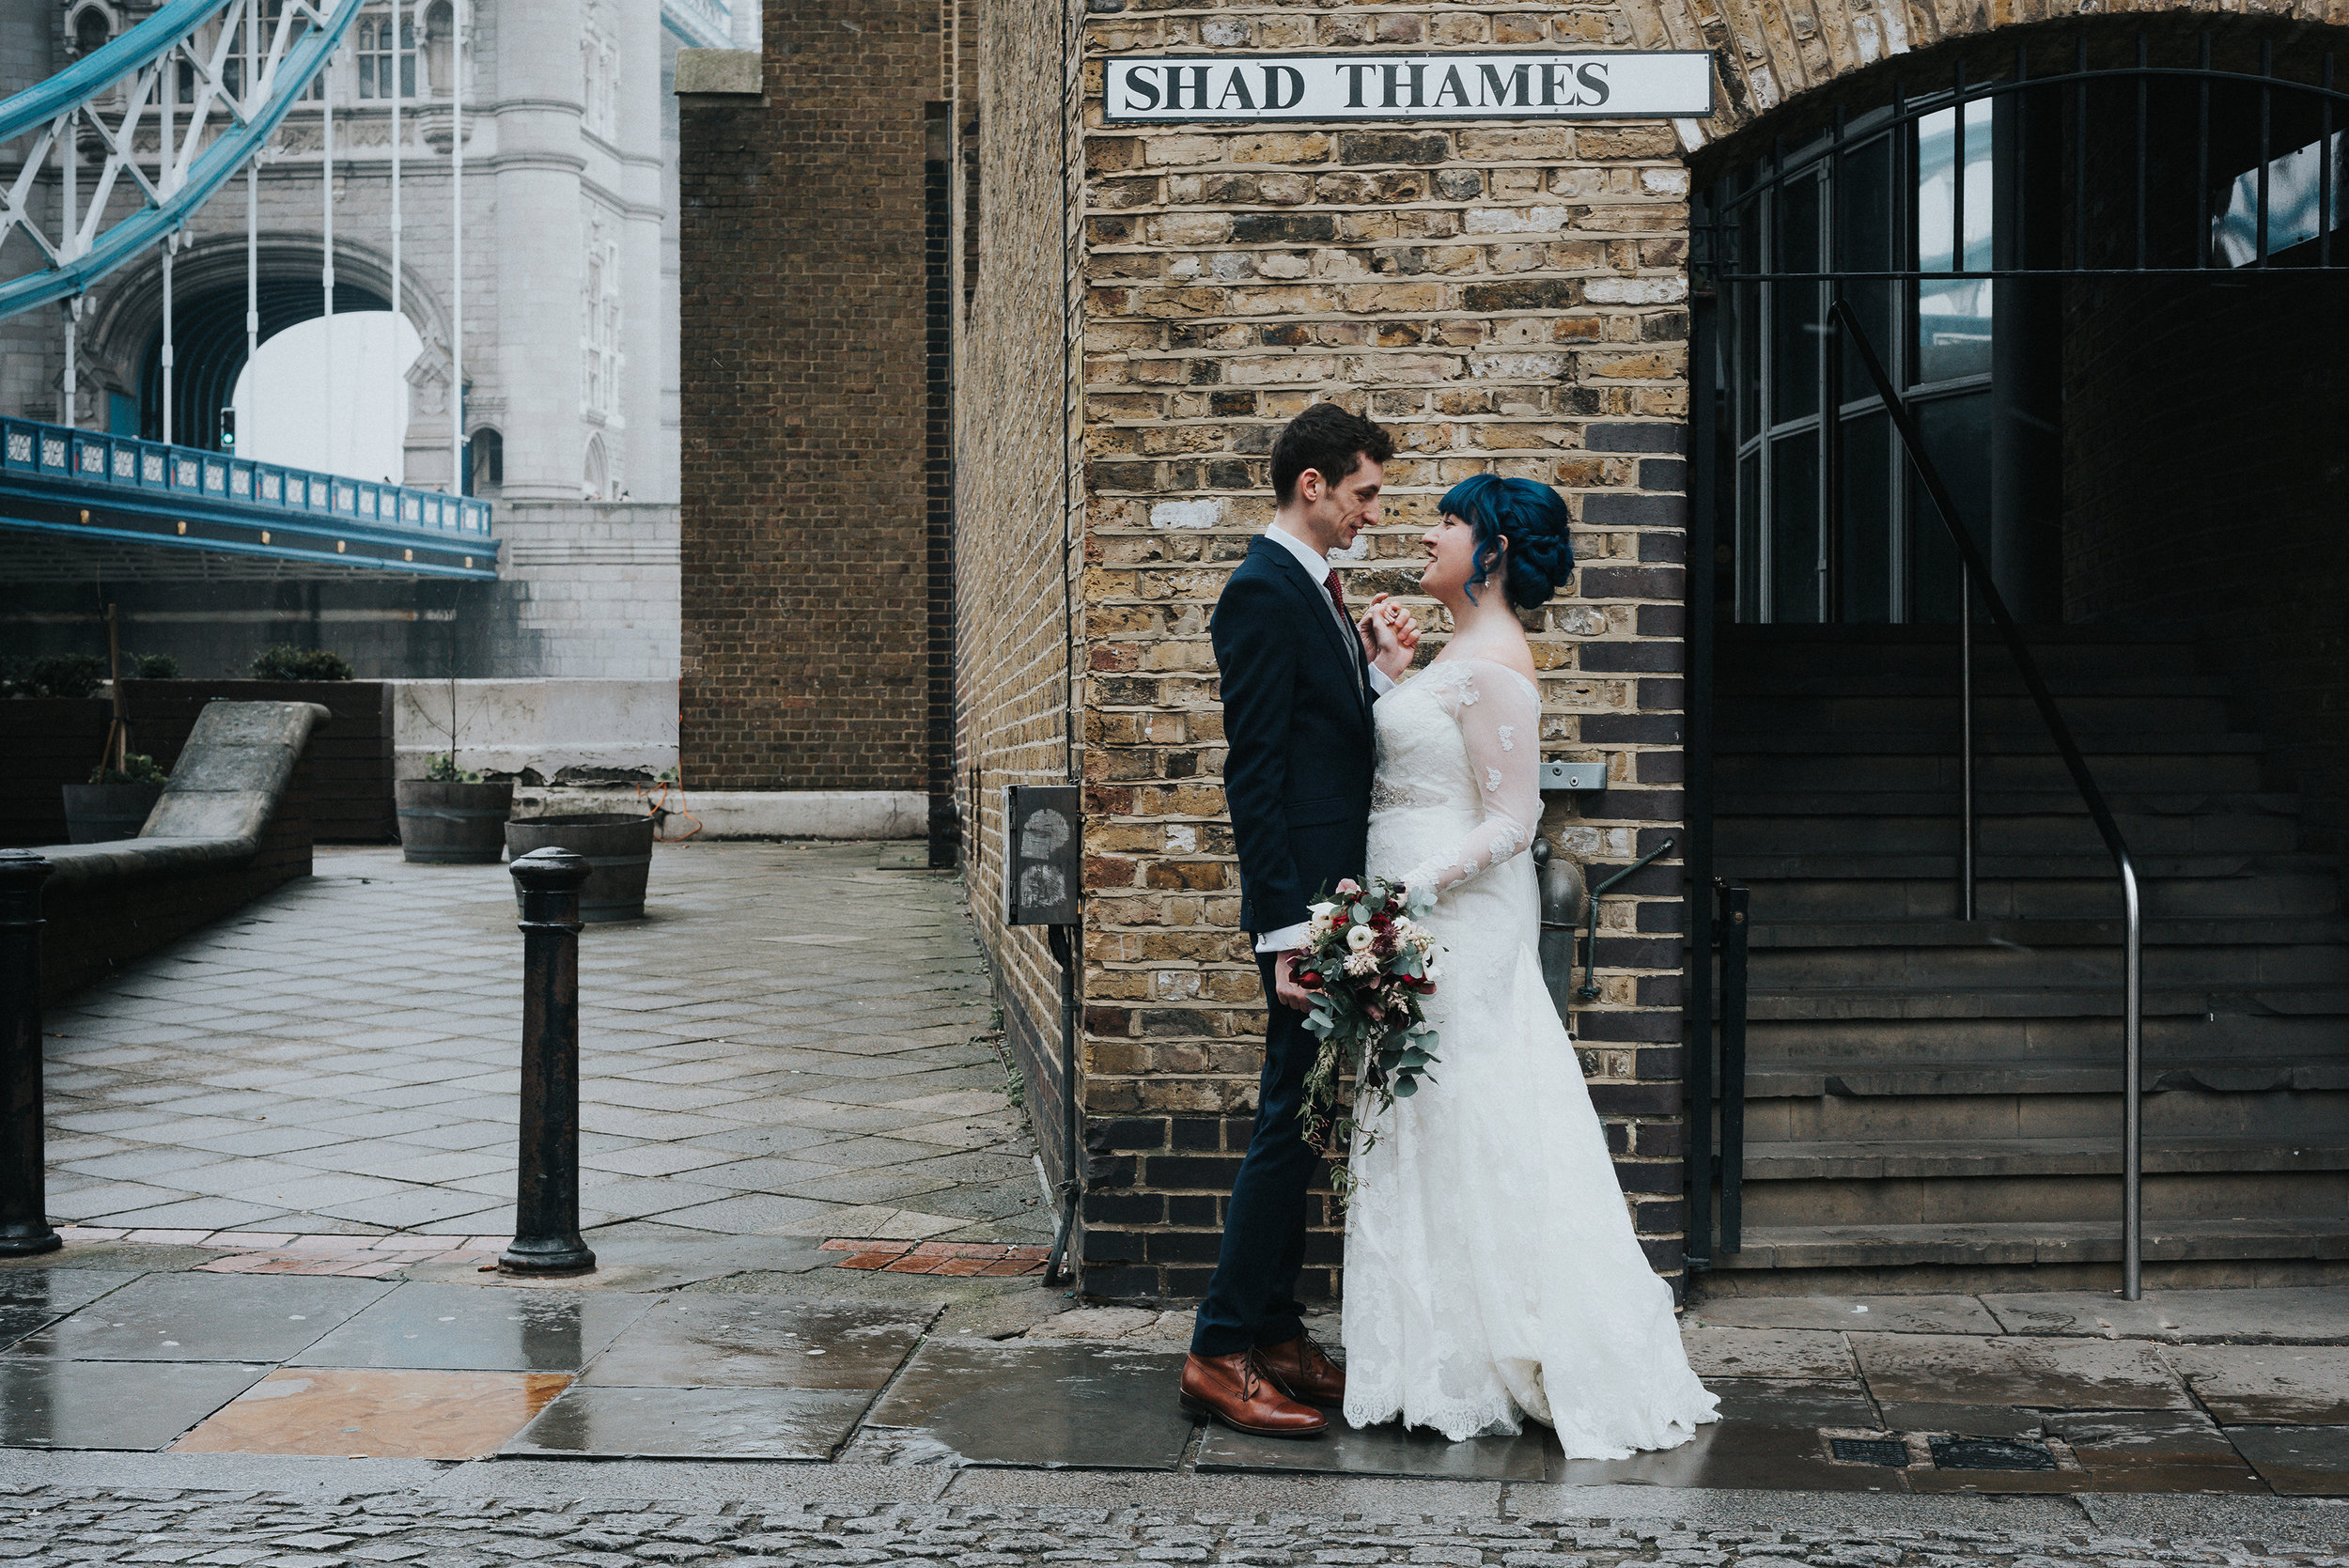 London-Chic-Alternative-Wedding-Jay-Tunbridge-Photographic-Co-8.jpg